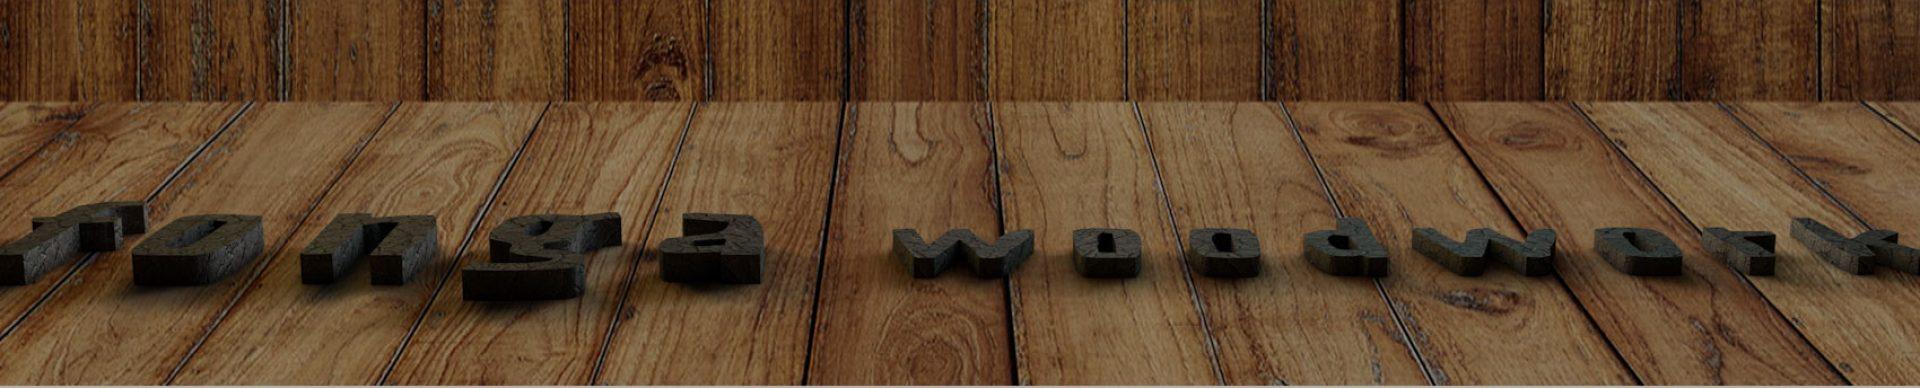 Fonga Wood Works